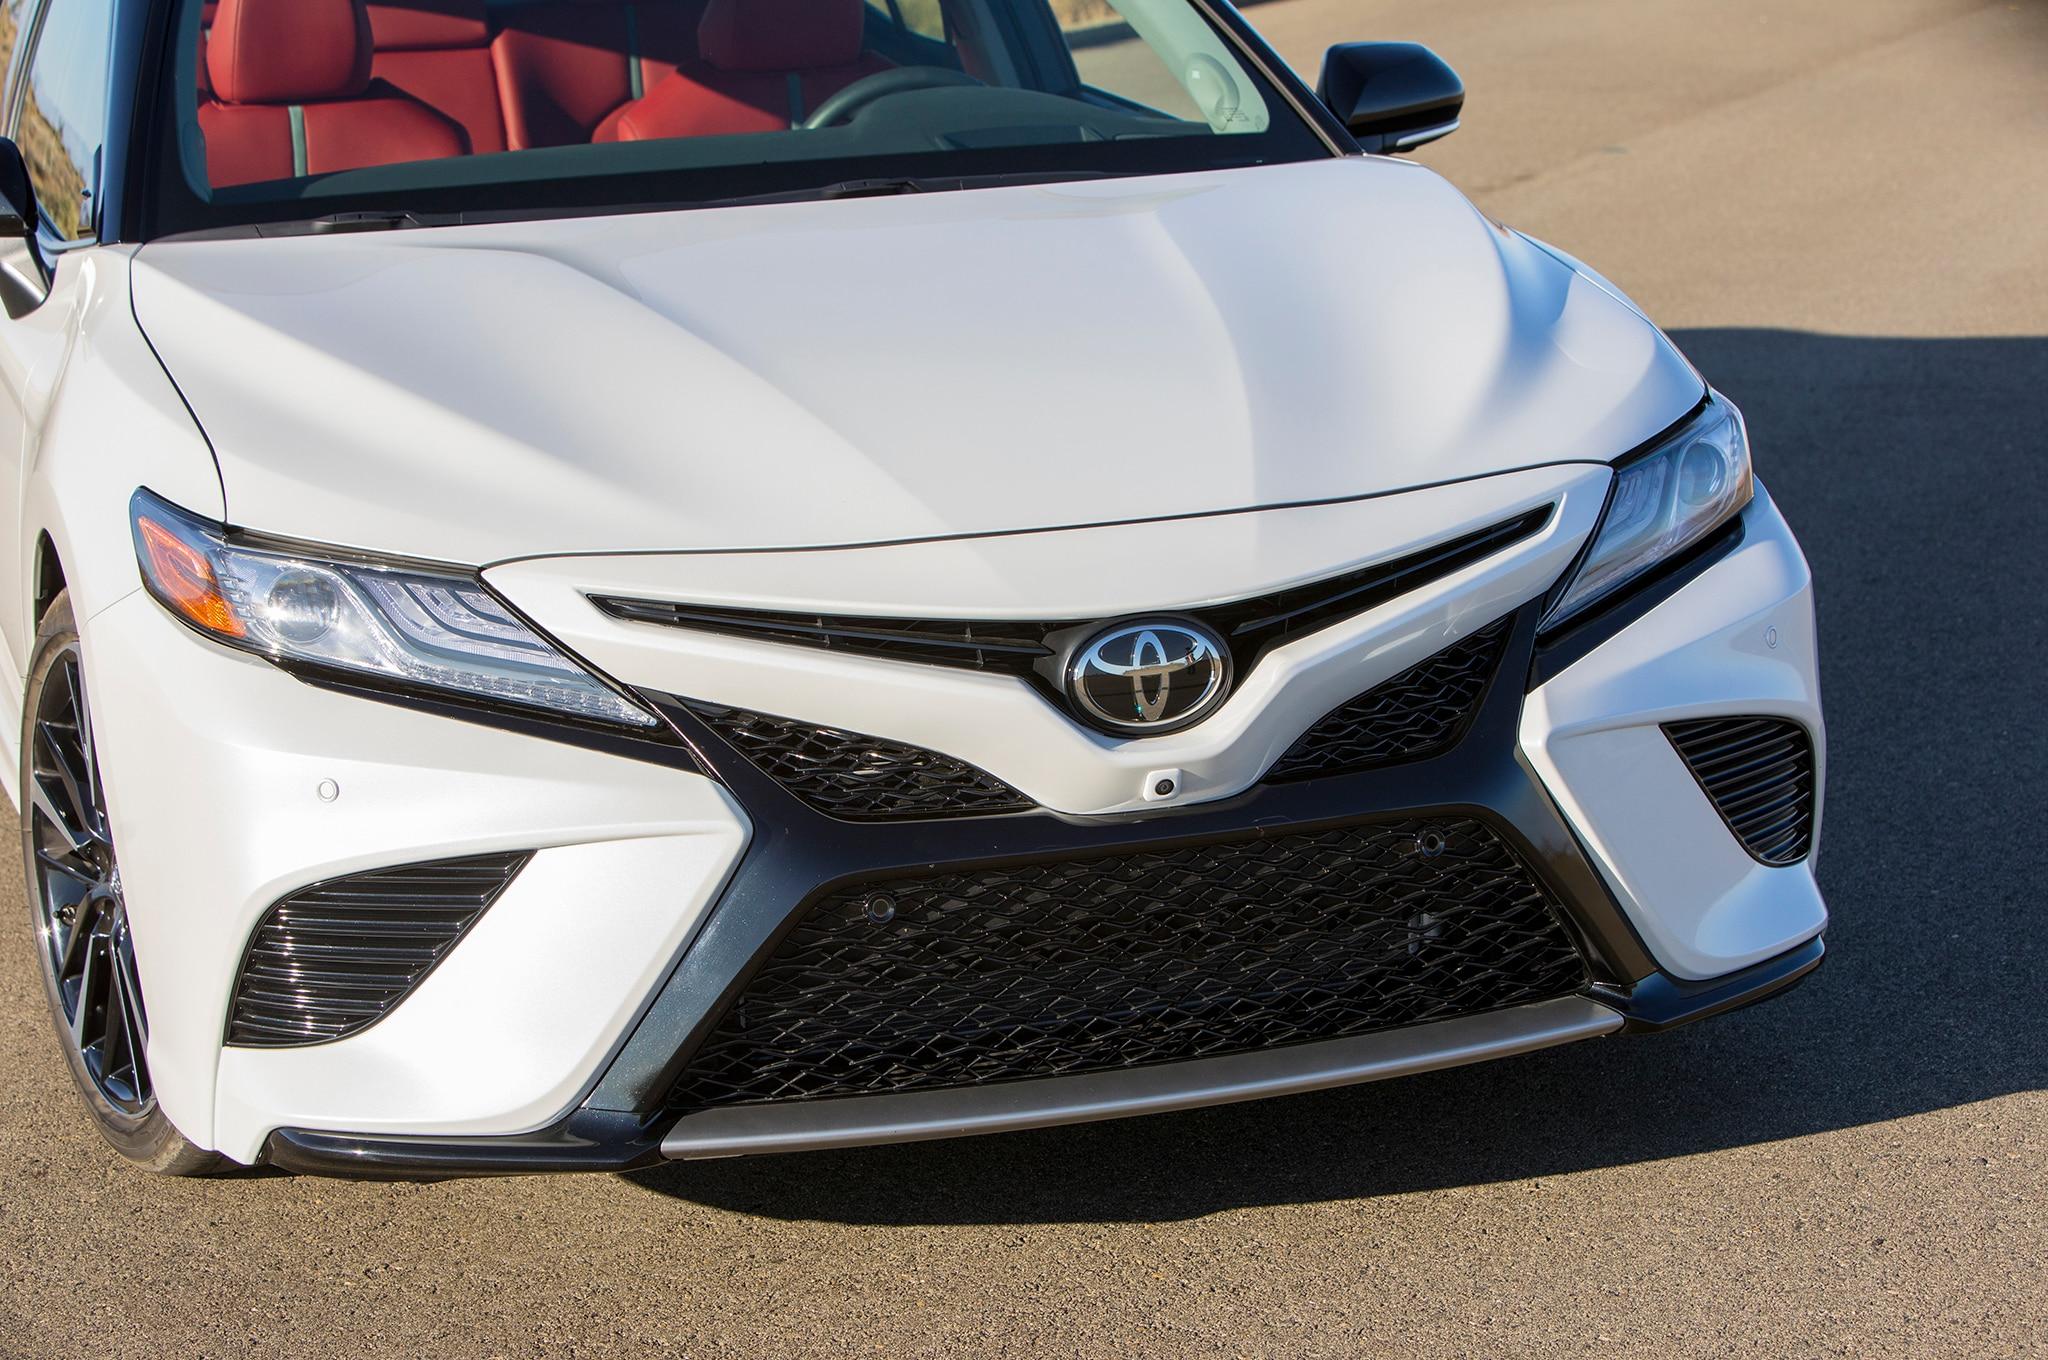 2017 Camry Xse >> 2019 Toyota Camry Hybrid Set for Europe | Automobile Magazine